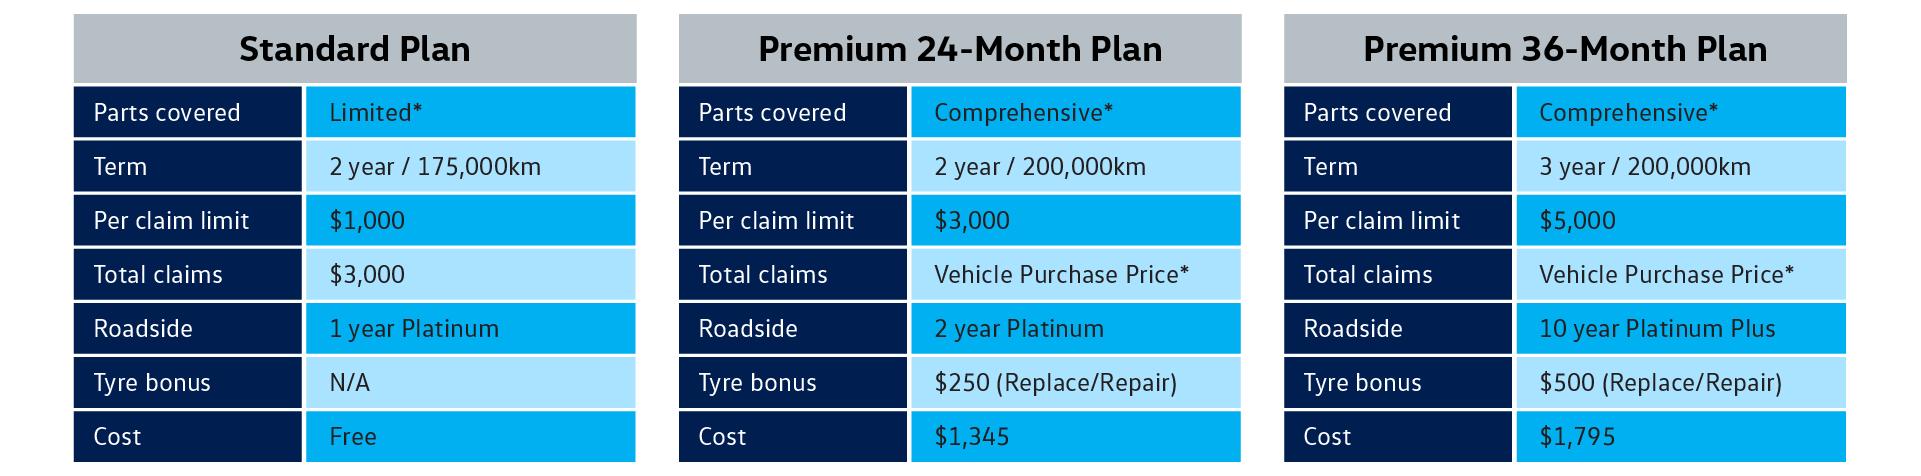 Customer-Care-Plan-Header-03